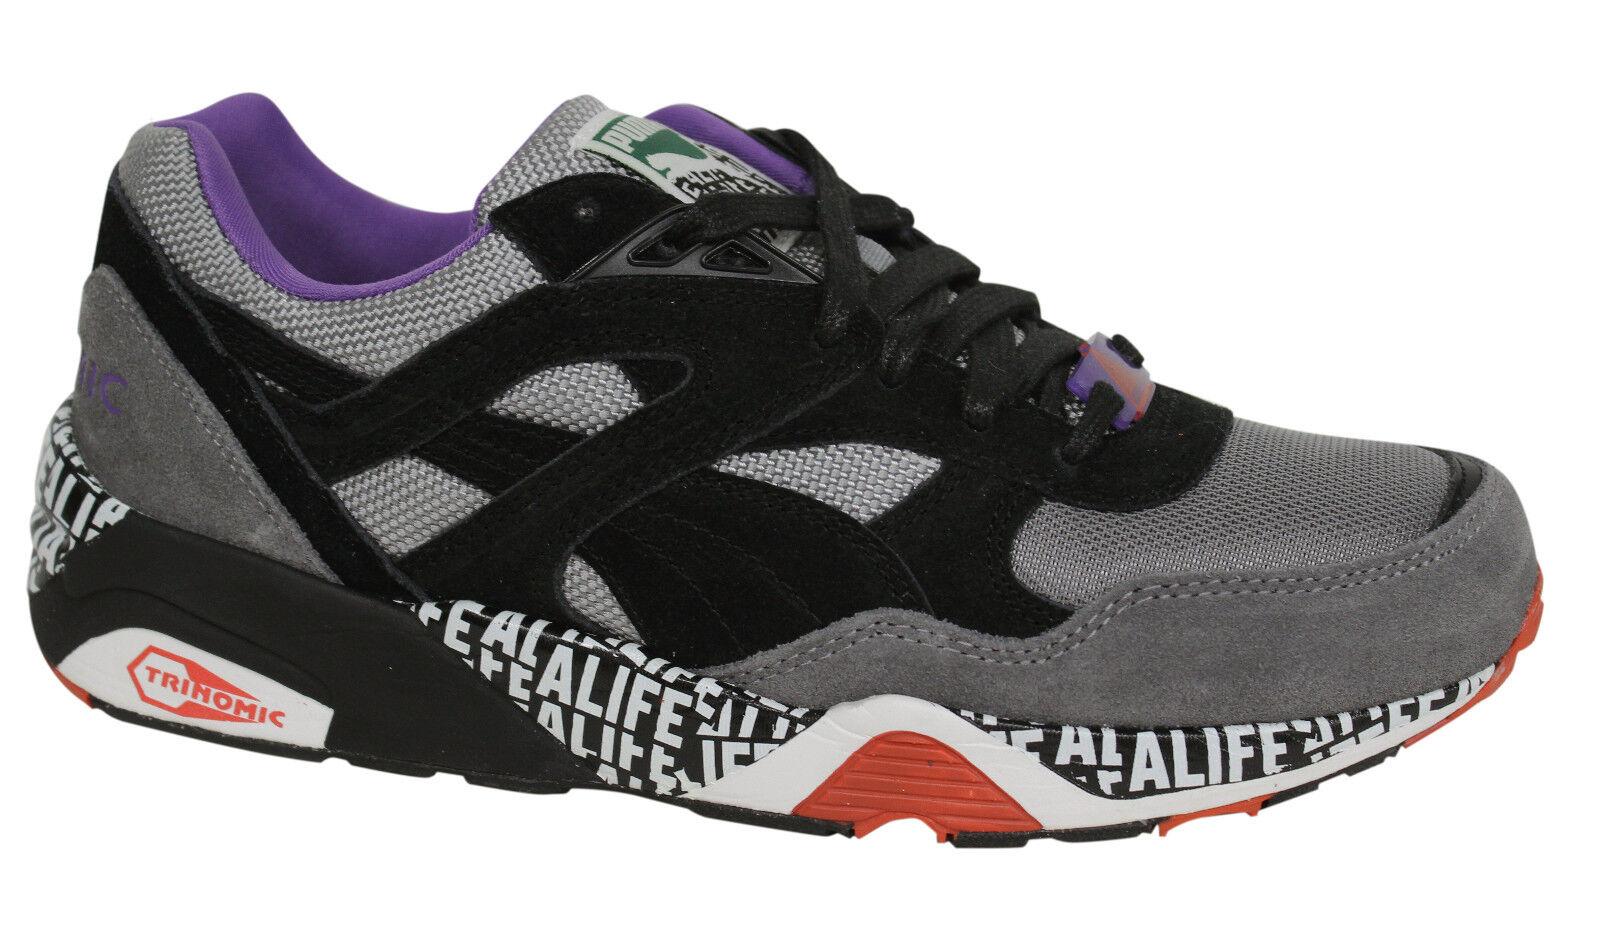 Puma R698 X STUCK UP X ALIFE Grey Black Mens Trainers Lace Up 358867 01 D35